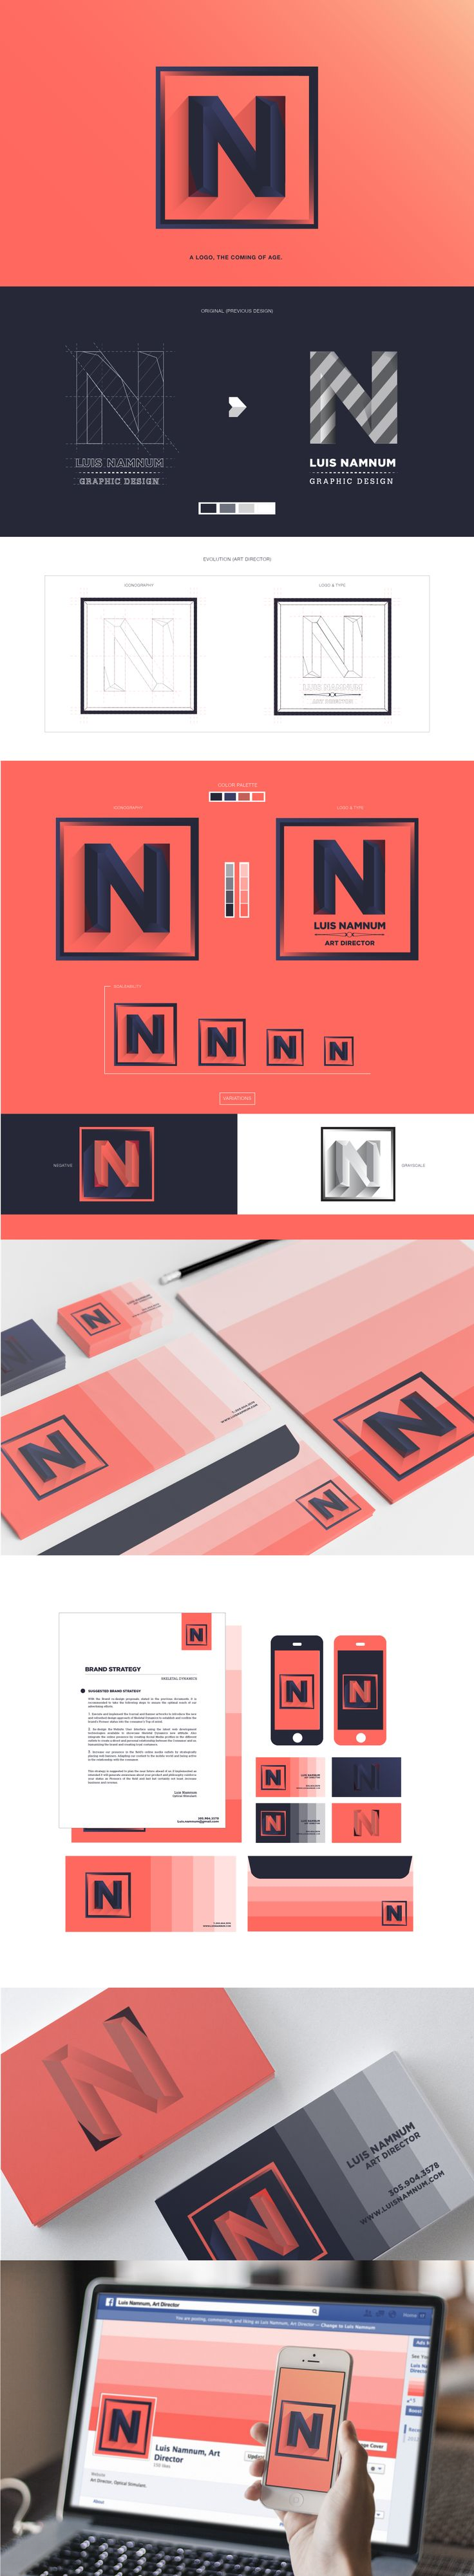 Brand Identity Re-design on Behance